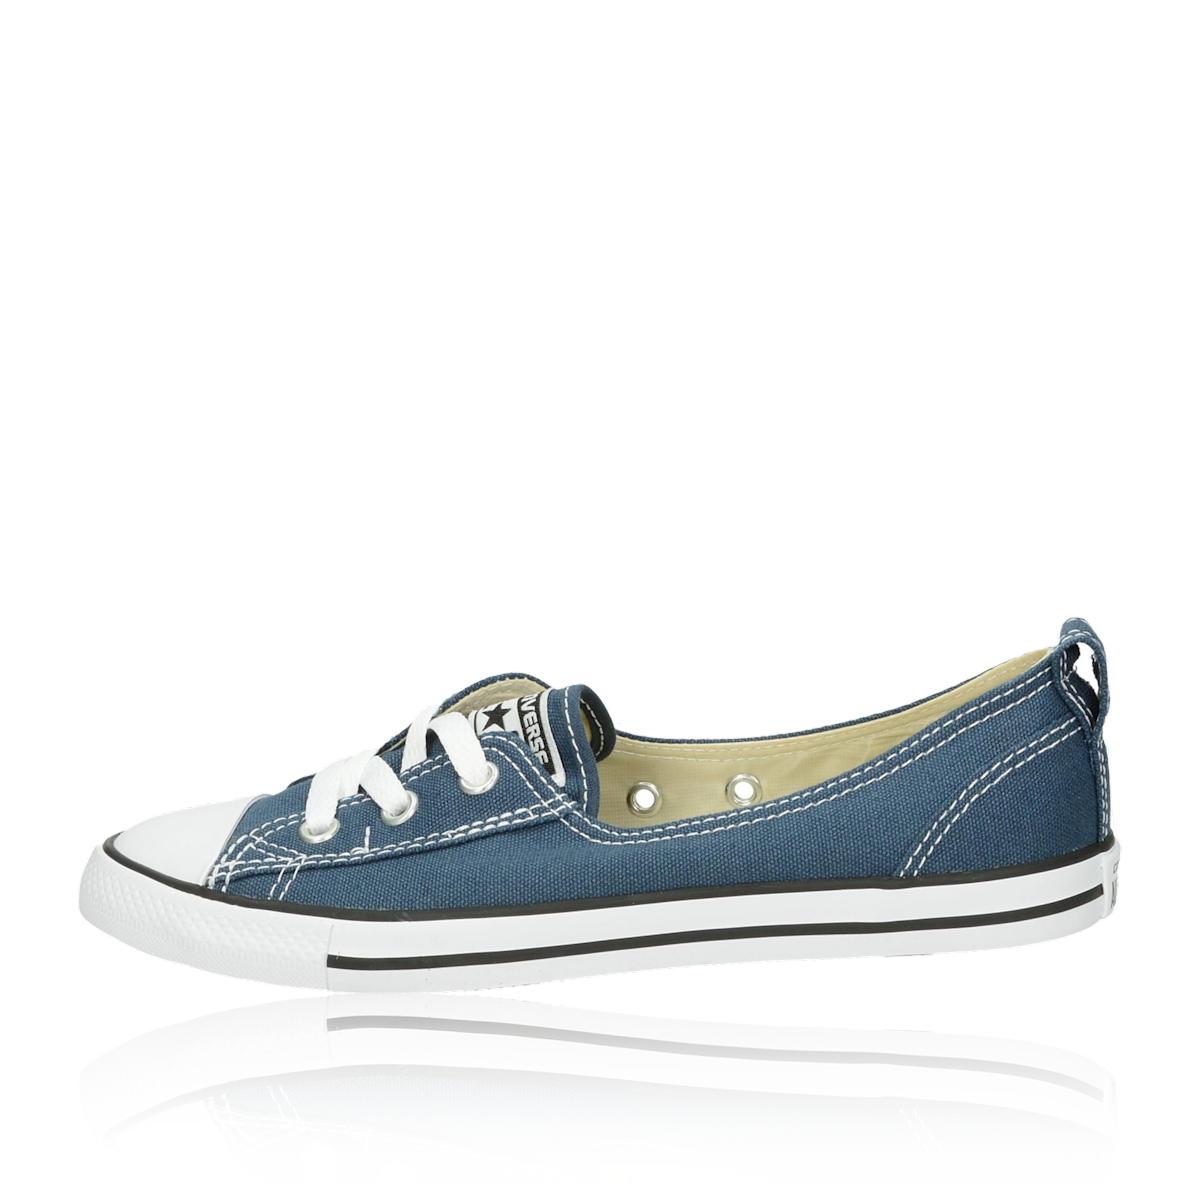 b009309669 Converse dámske tenisky - modré Converse dámske tenisky - modré ...